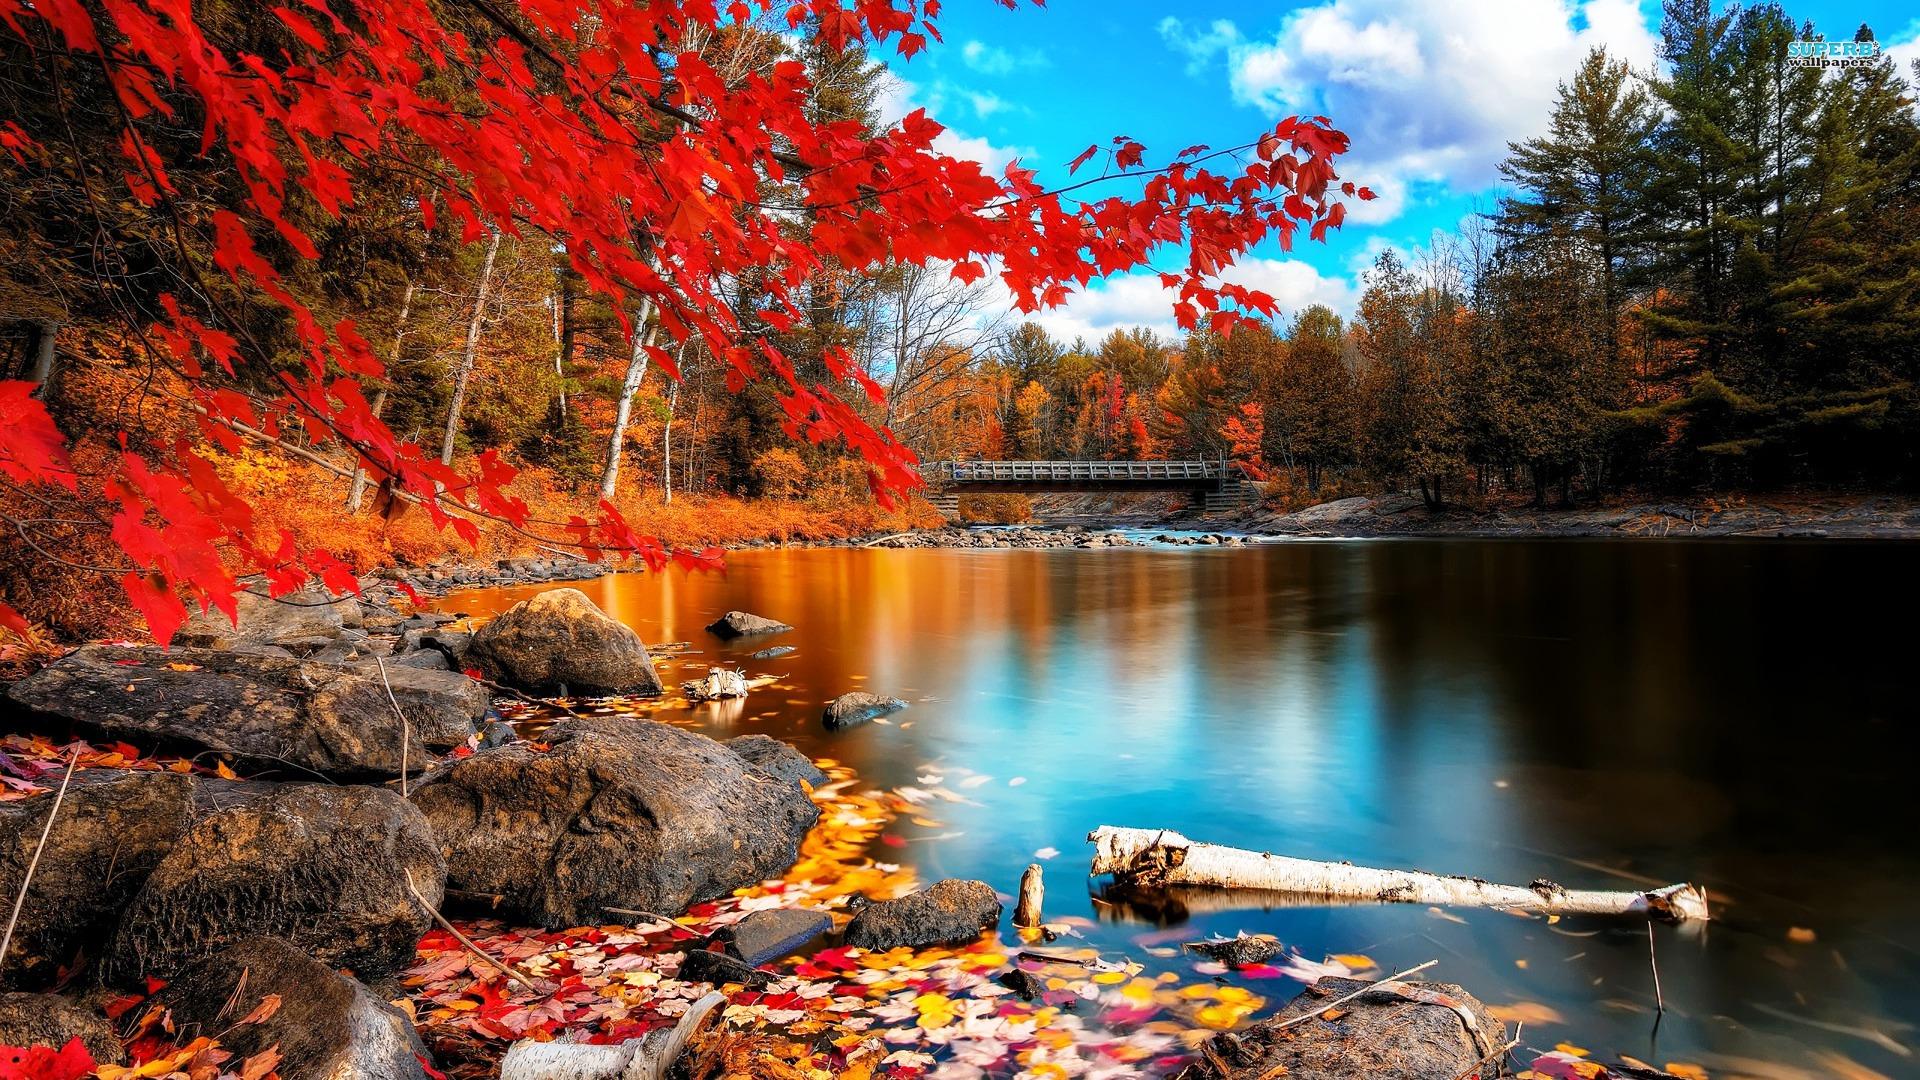 HD Lake Autumn Beauty 2158 - Nature HD Desktop Wallpaper